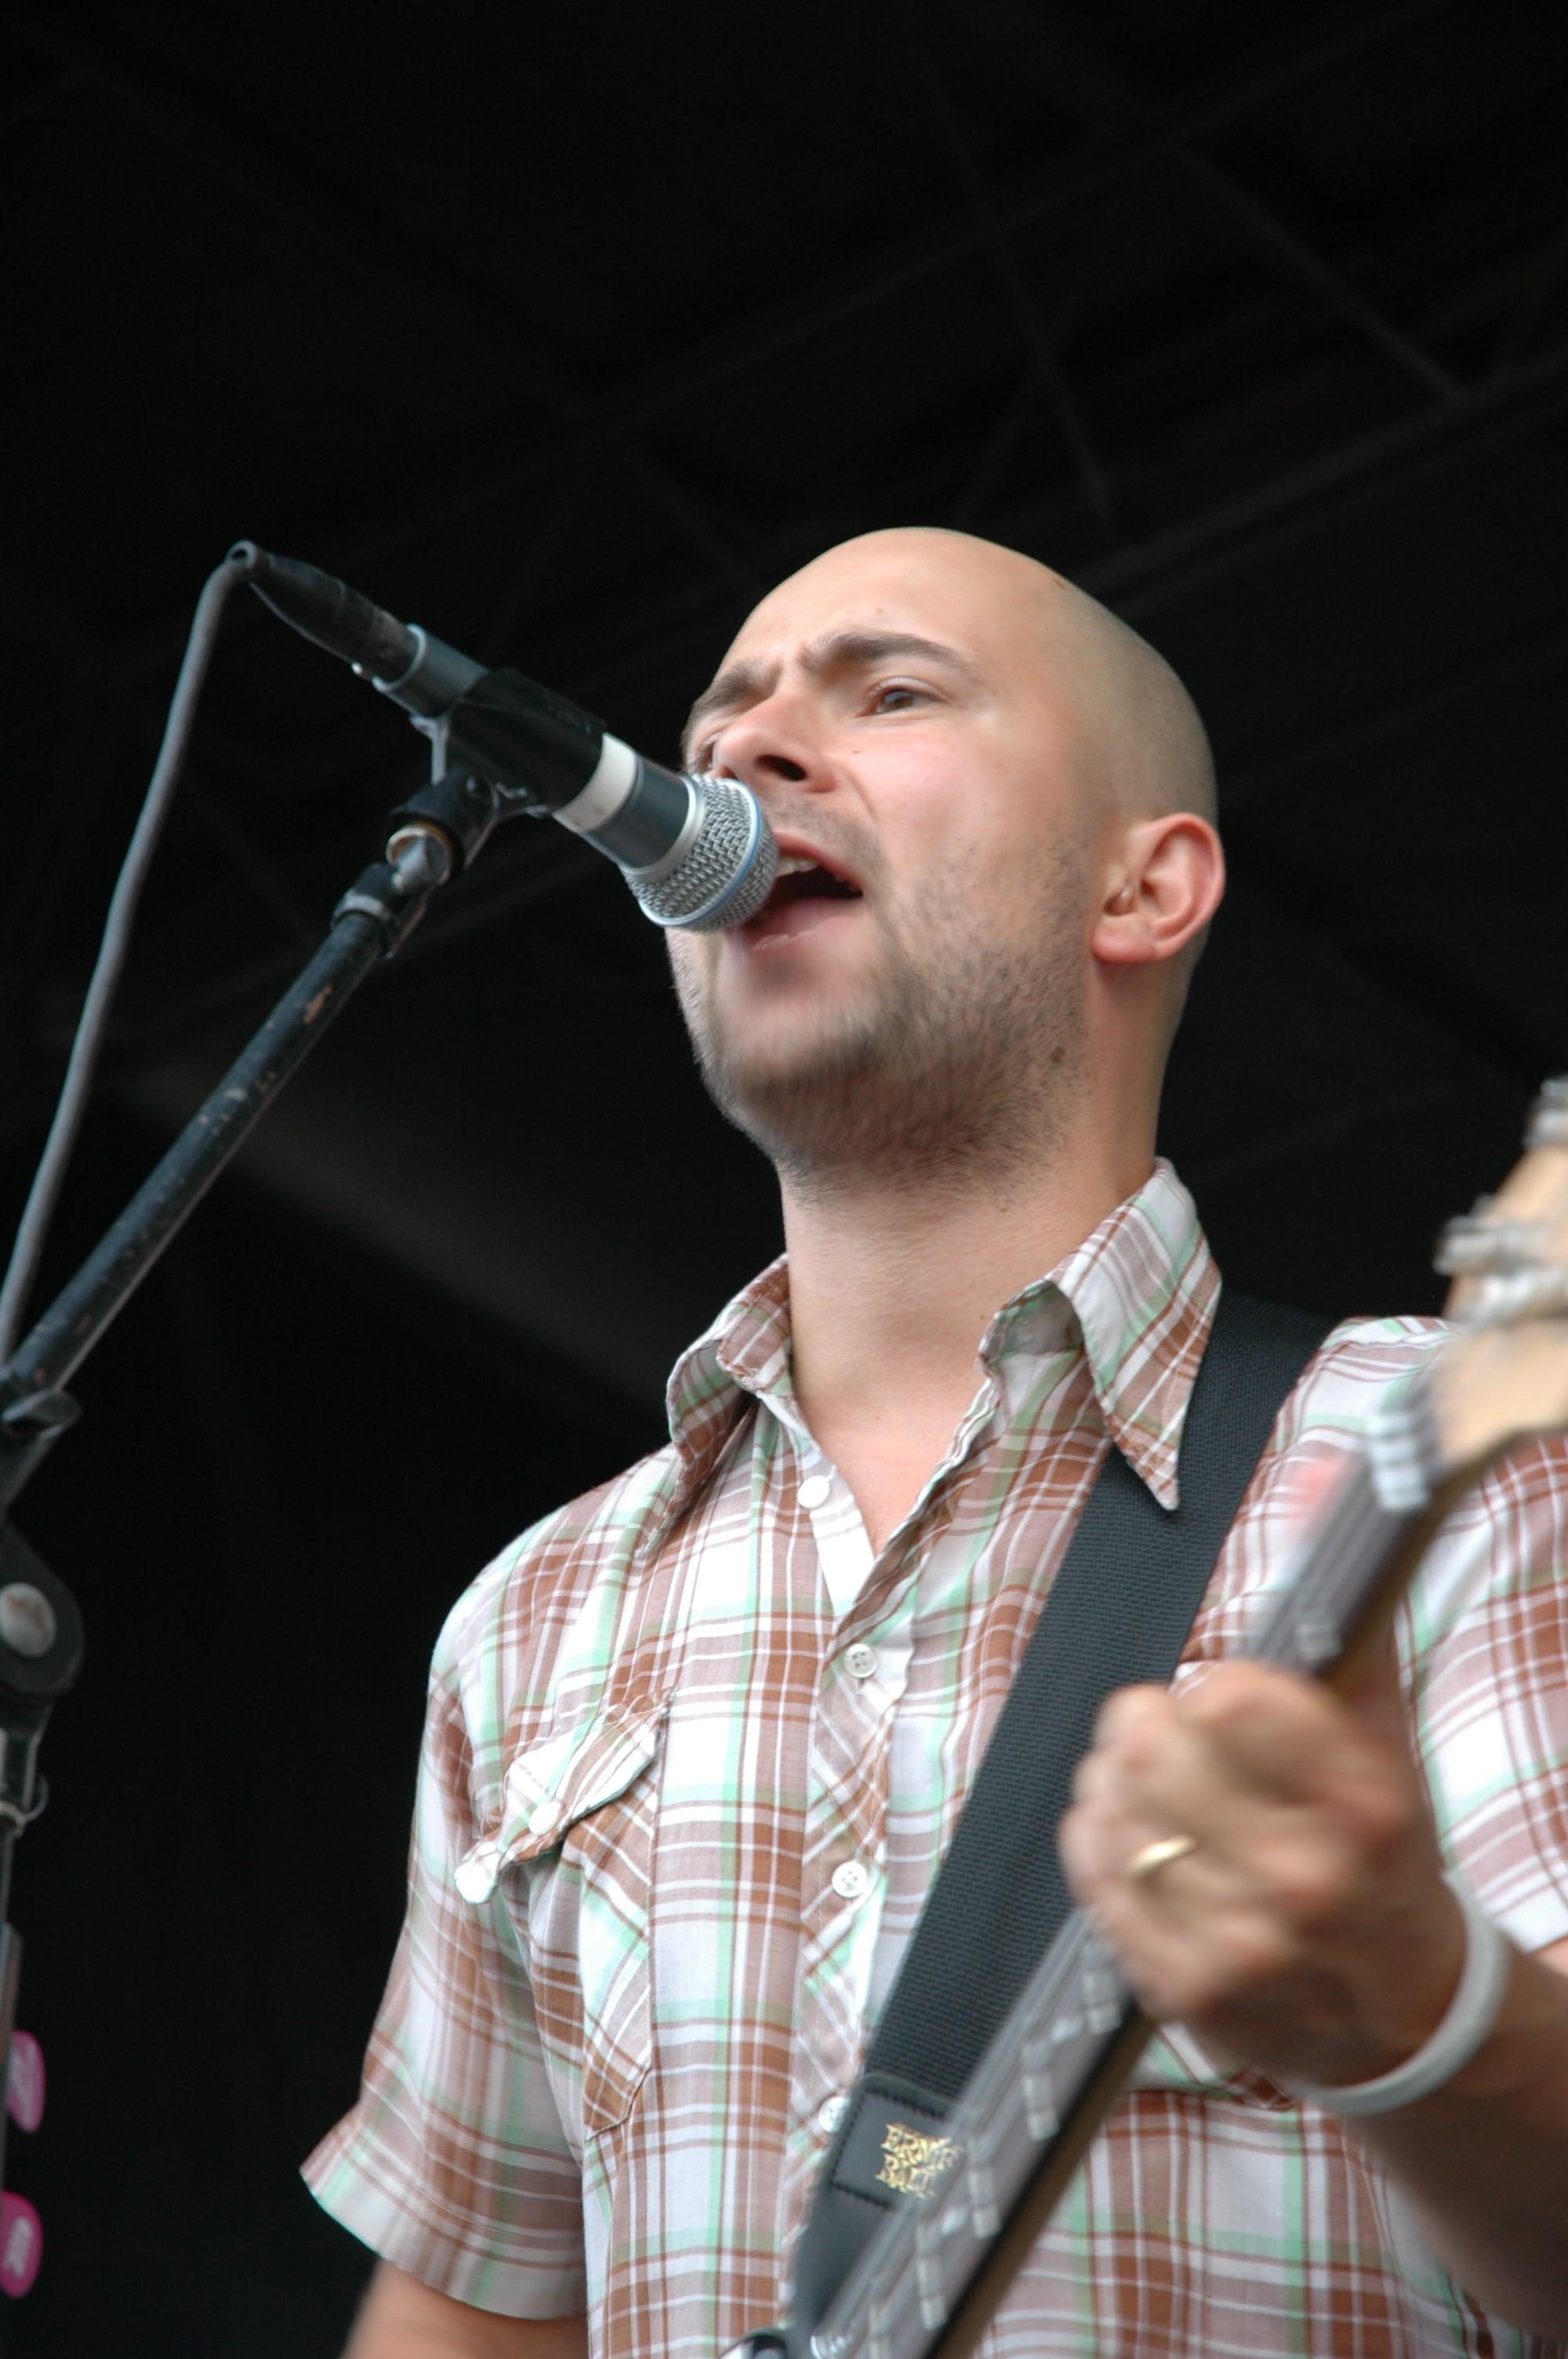 Millencolin @ Warped Tour 05, NYC - 8.12.05 (12)